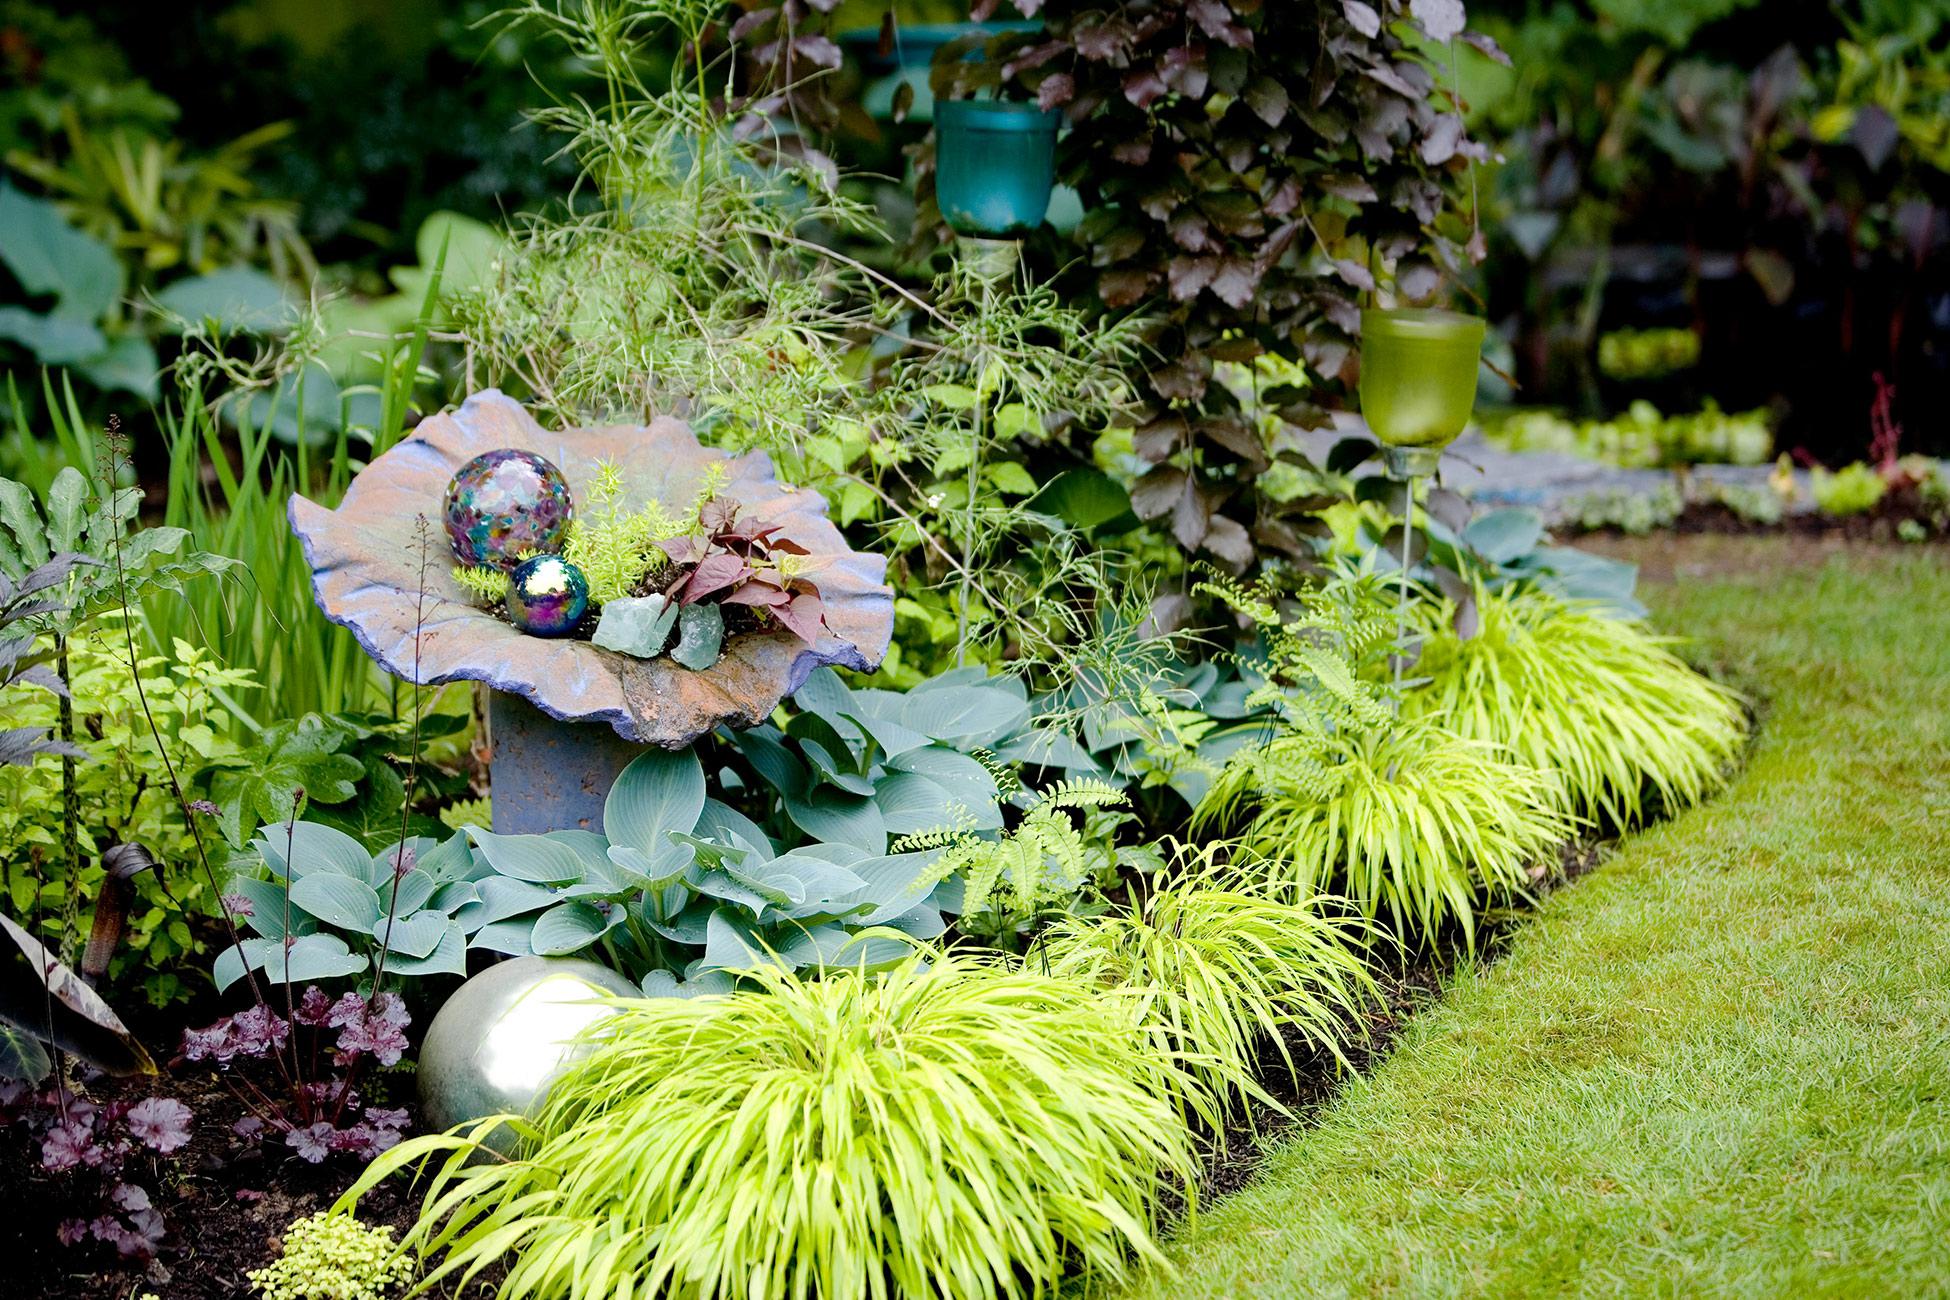 Poisonous Plants You Should Avoid in Your Garden (Part 1)